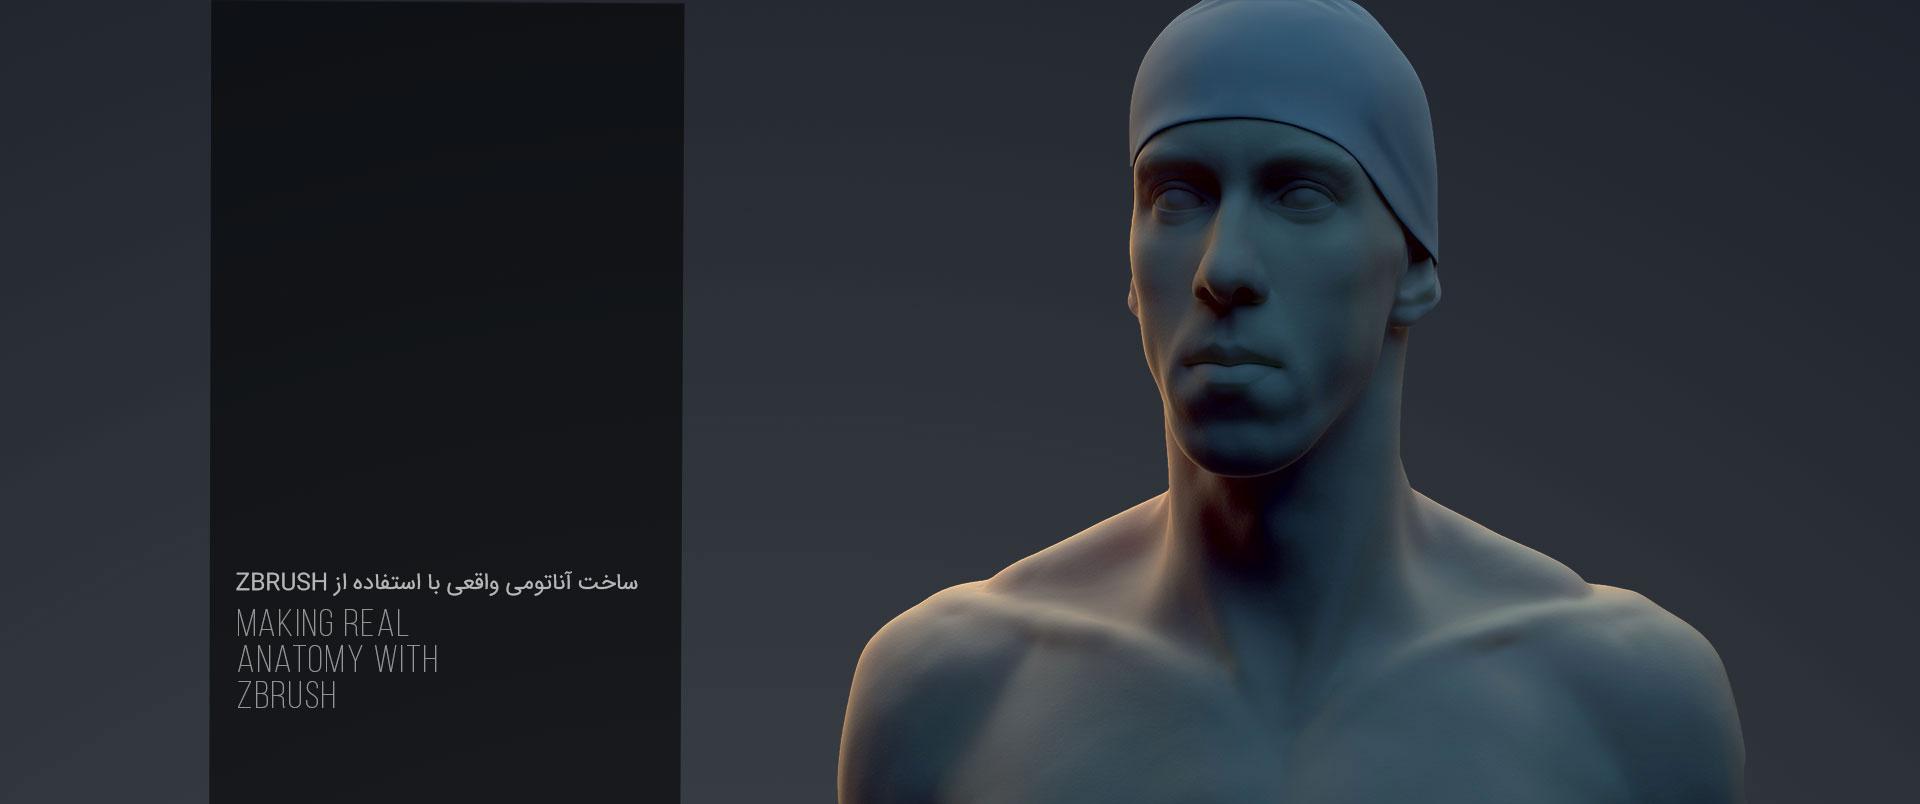 mojasamesazi anatomi zibrush1 - آموزش ساخت آناتومی در زیبراش